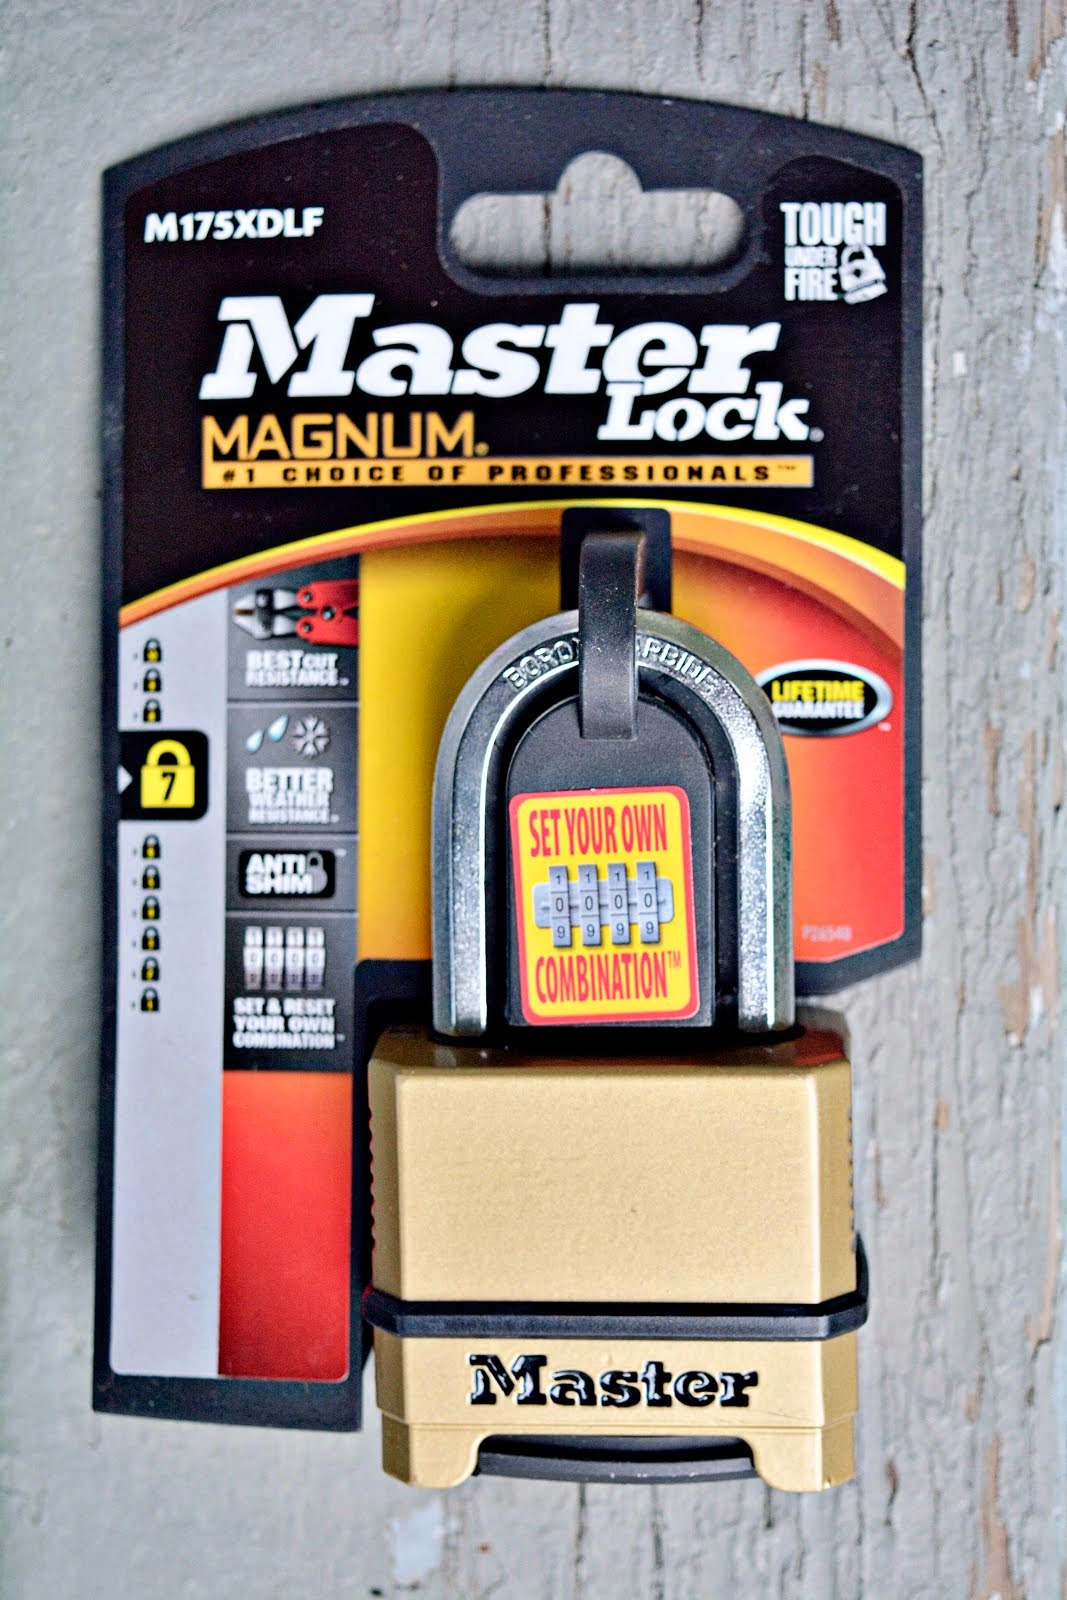 Enter To Win Master Lock!